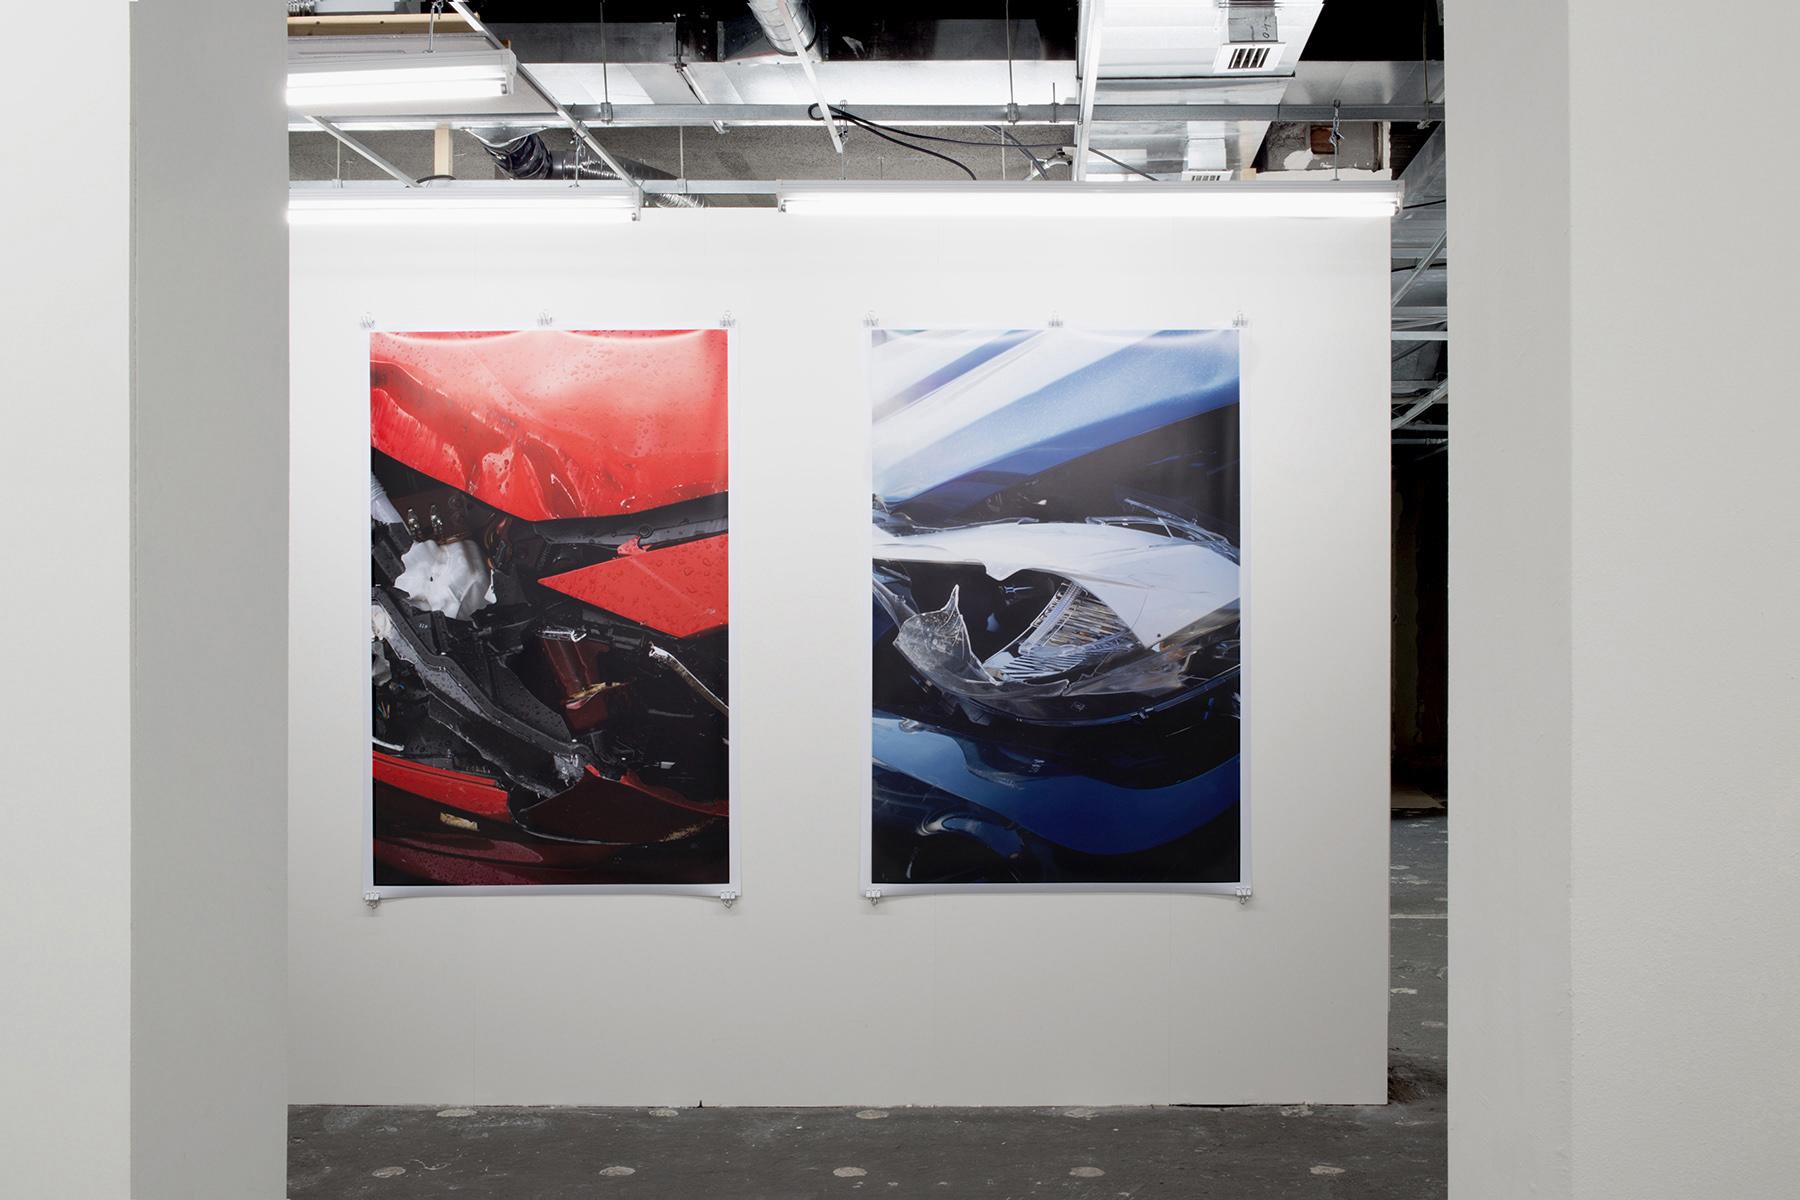 Chris Drange, Christoph David Drange, Shape Shifter, MISANO,  KOBALT Crash Installation view, Photo Bastei, exhibition